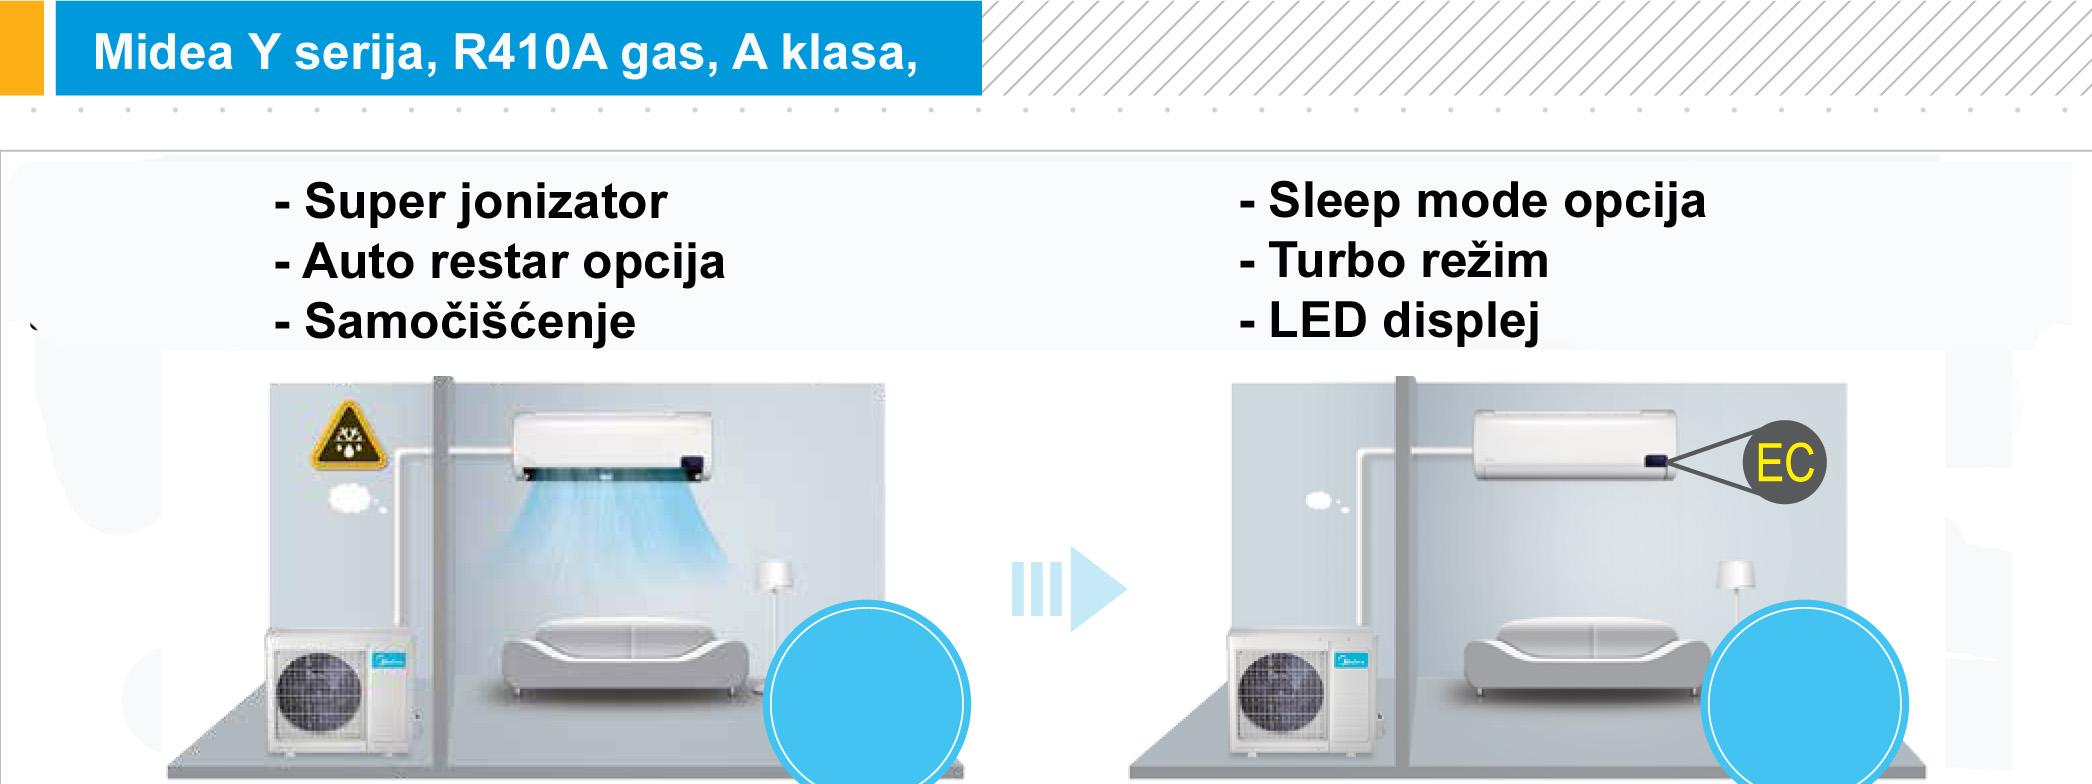 Midea klima uređaj y serija